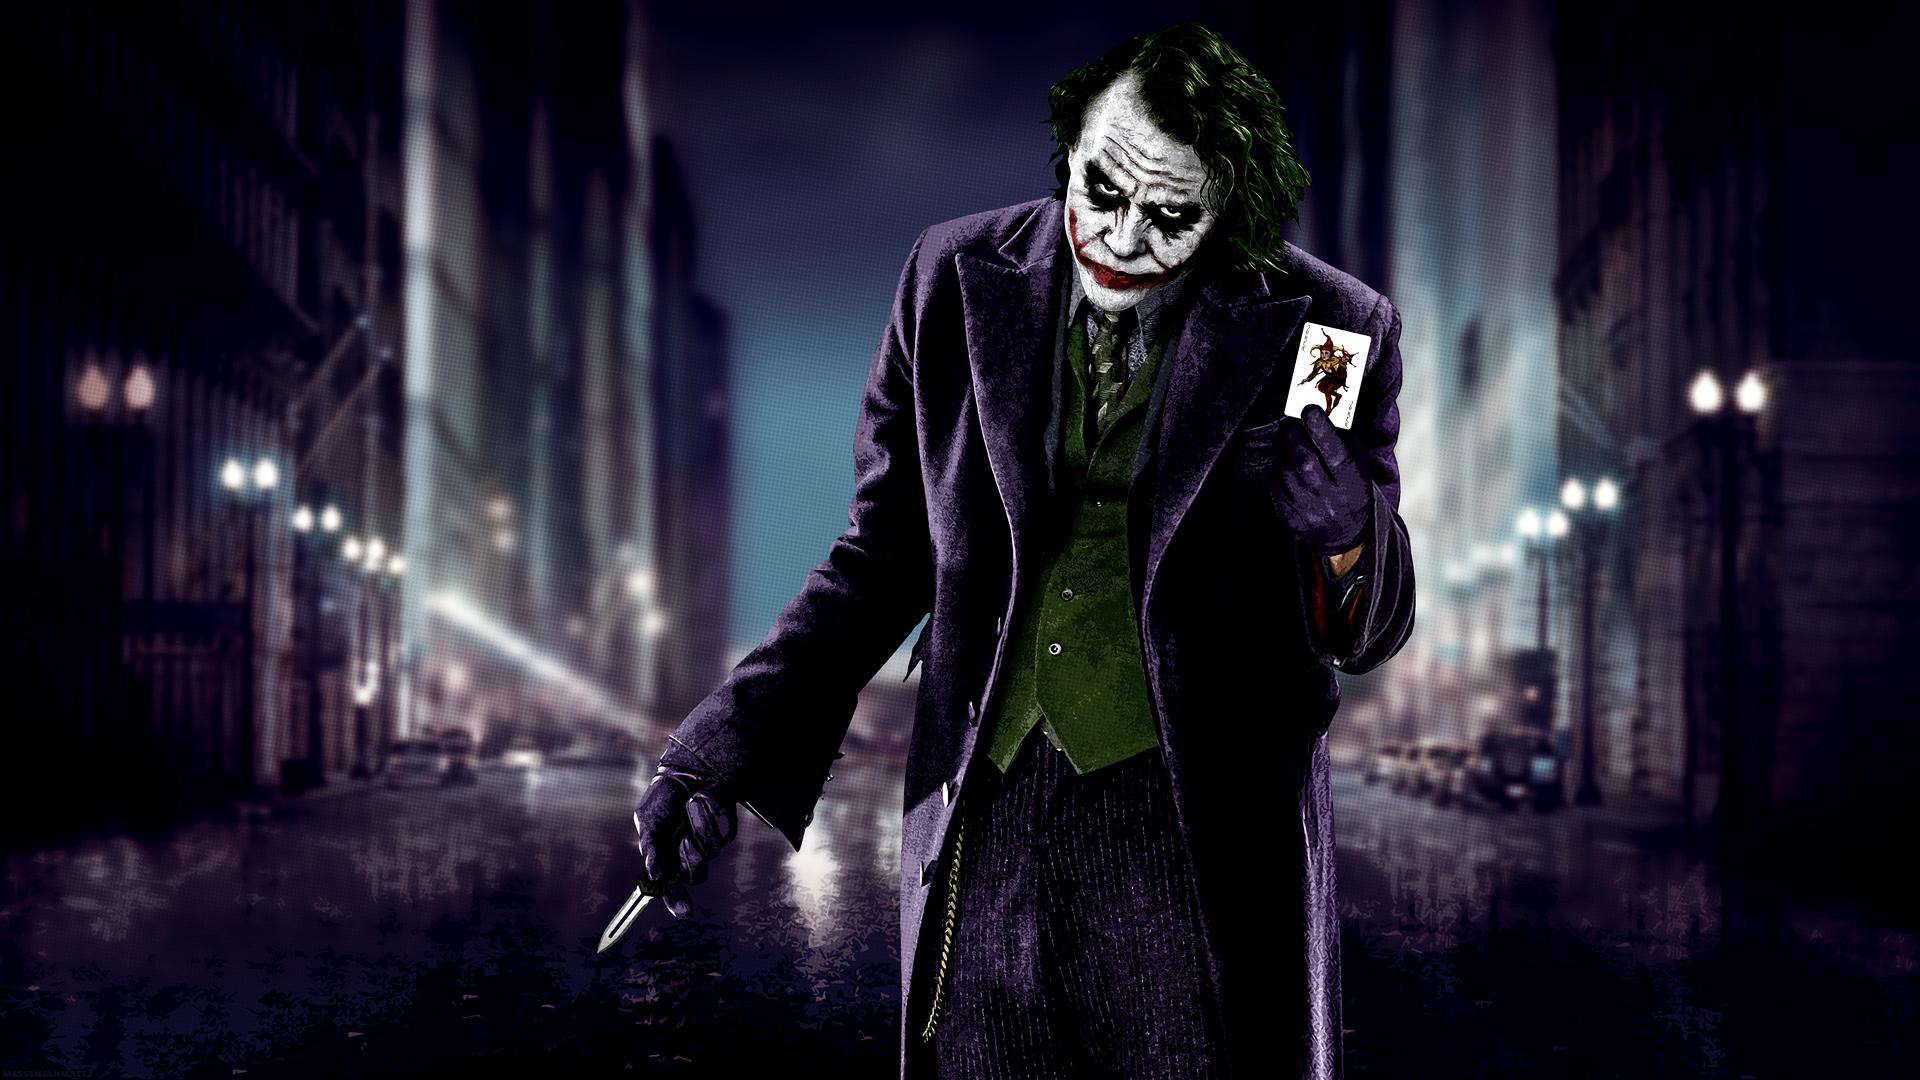 Joker Full Hd Wallpaper Joker Heath Ledger Wallpaper 4k 63898 Hd Wallpaper Backgrounds Download